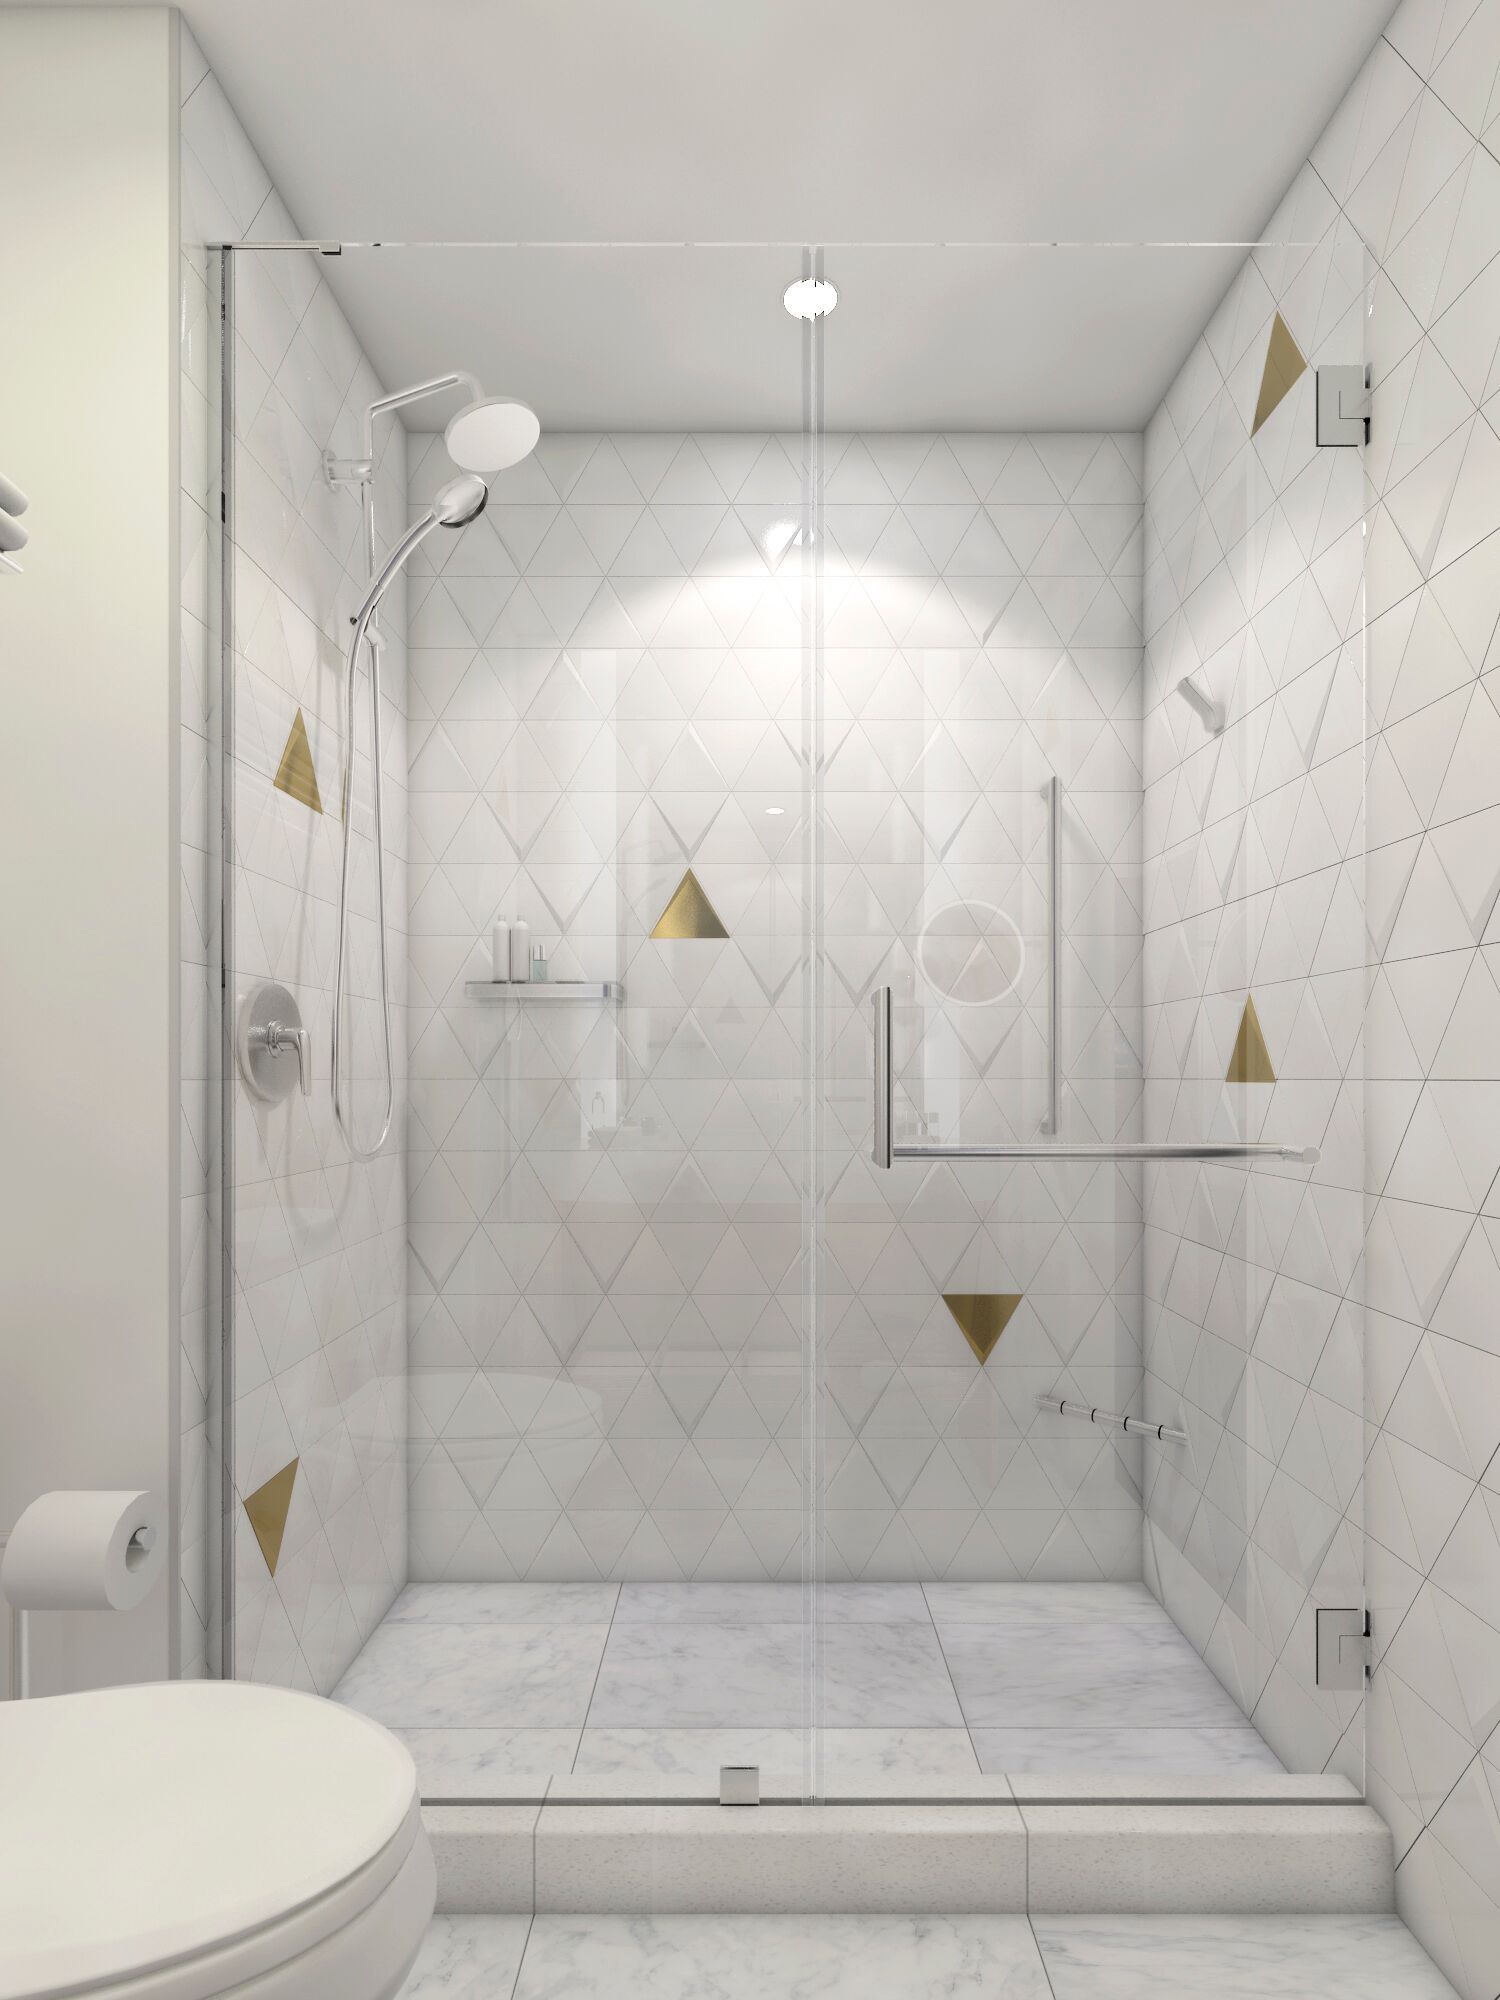 A remodeled bathroom